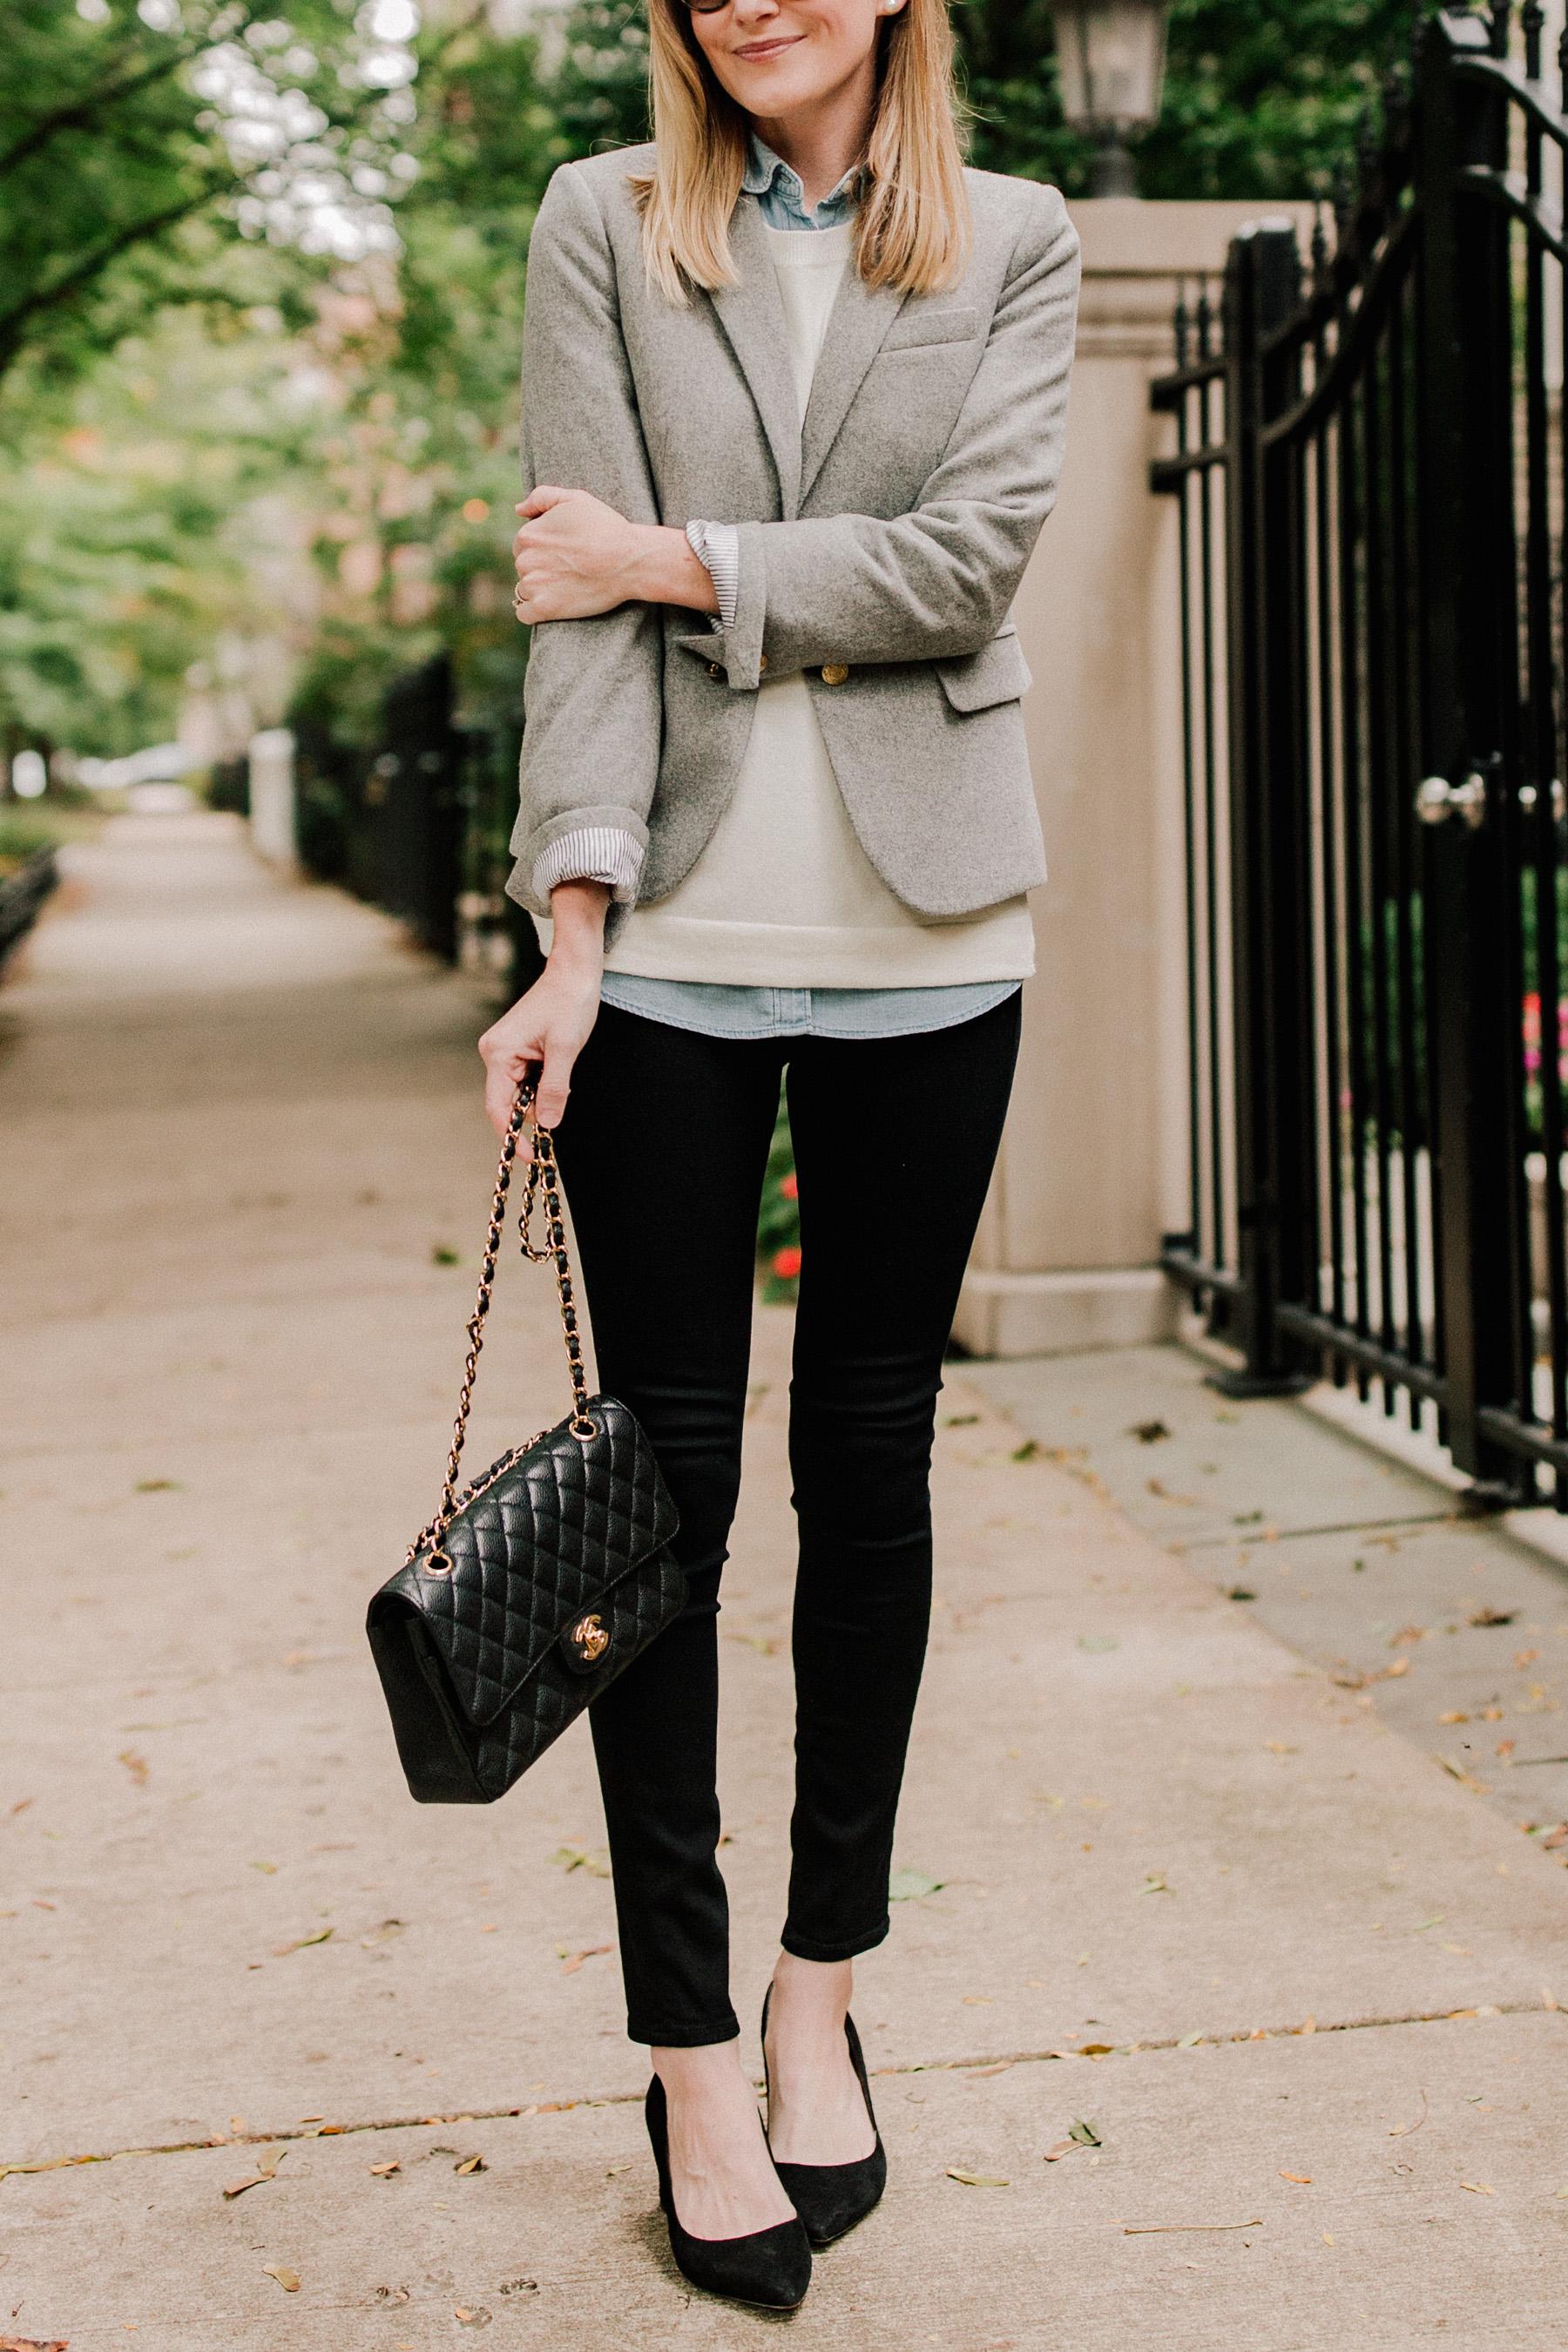 Chambray Shirt / Crewneck Sweater / Schoolboy Blazer/ Black Pumps